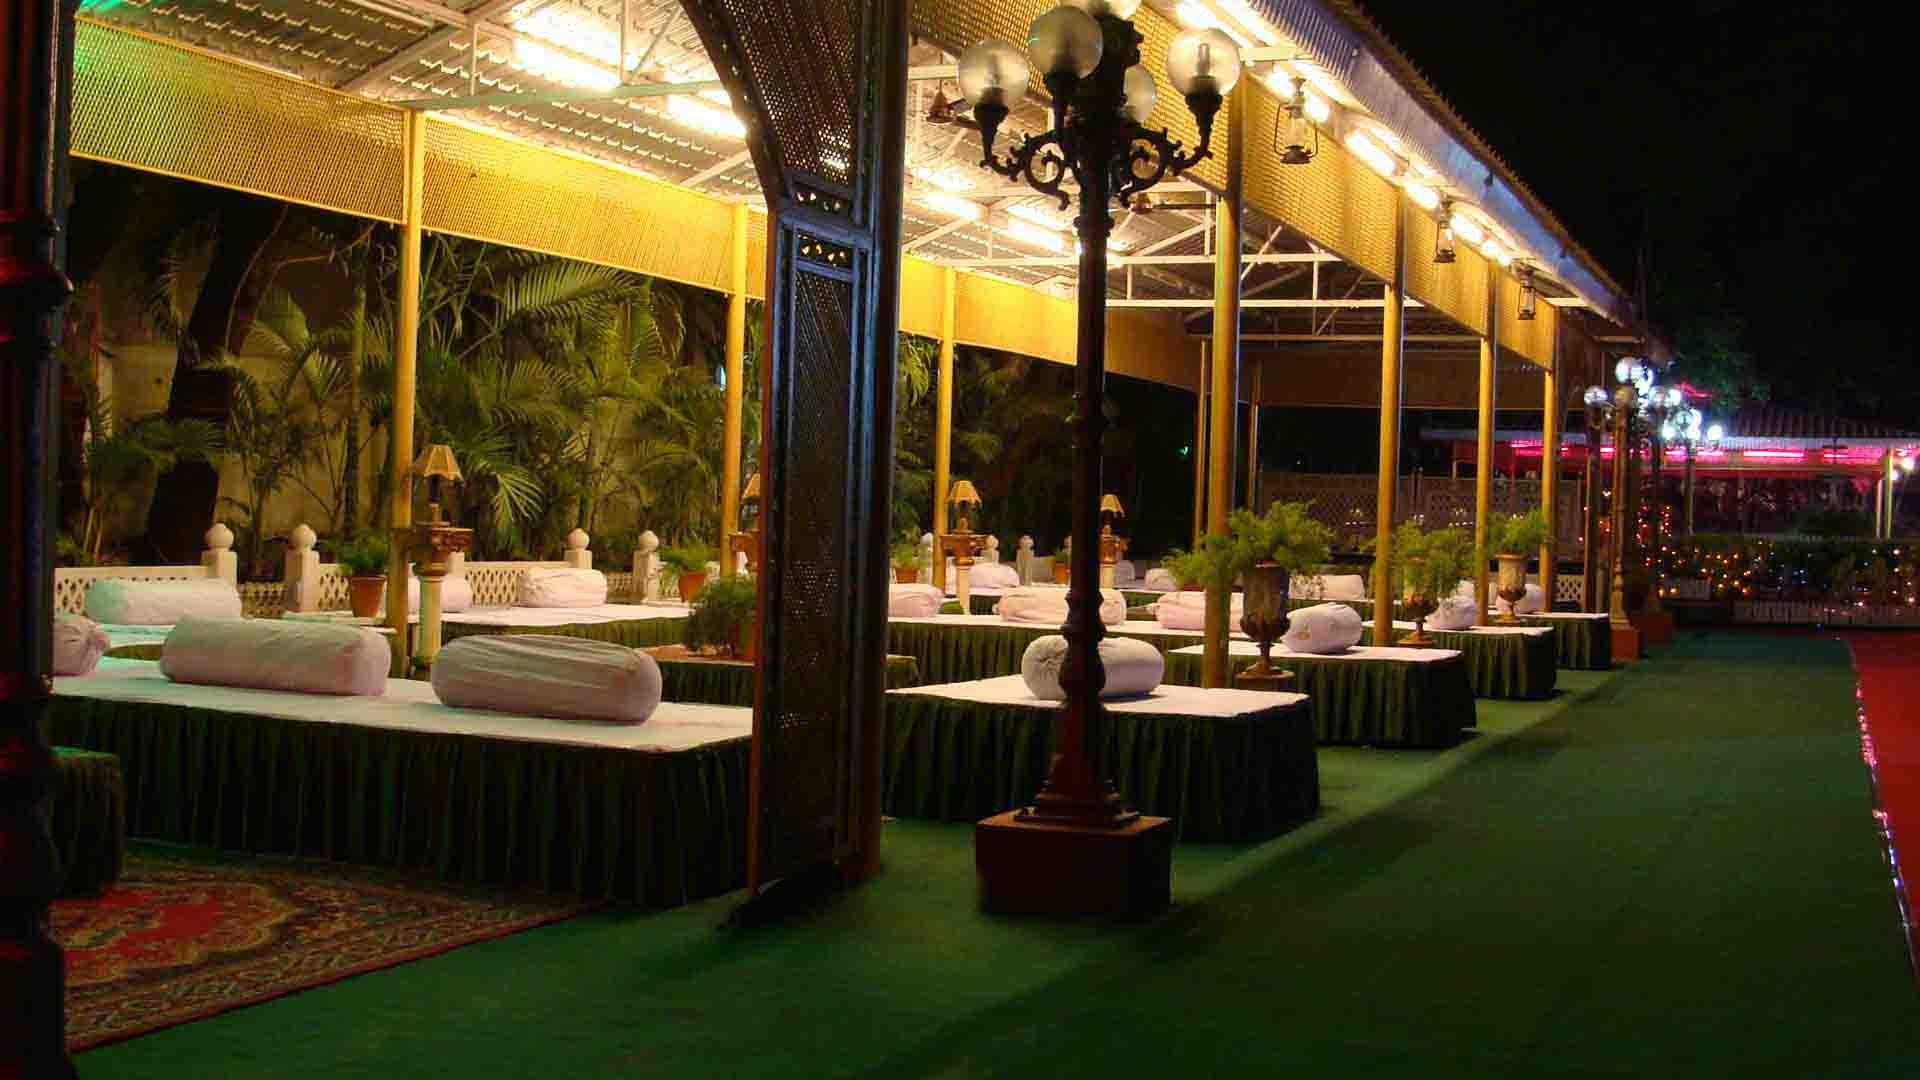 47394f24bf2ac7c80854d870c7d14e85 - Image Gardens Function Hall Hyderabad Telangana